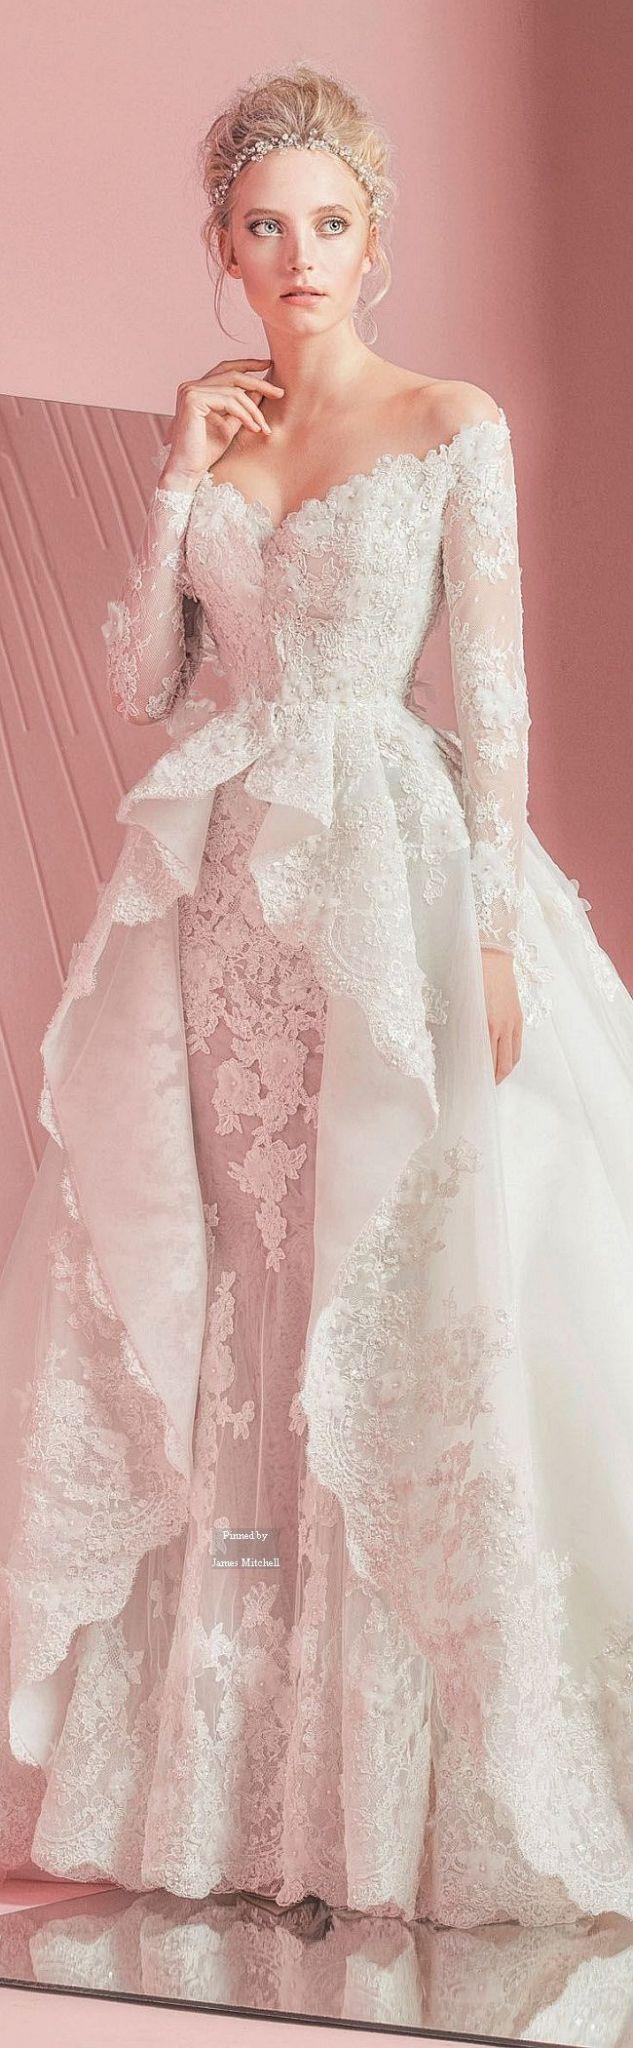 Zuhair Murad Wedding Dresses Prices - Dressy Dresses for Weddings Check more at http://svesty.com/zuhair-murad-wedding-dresses-prices/